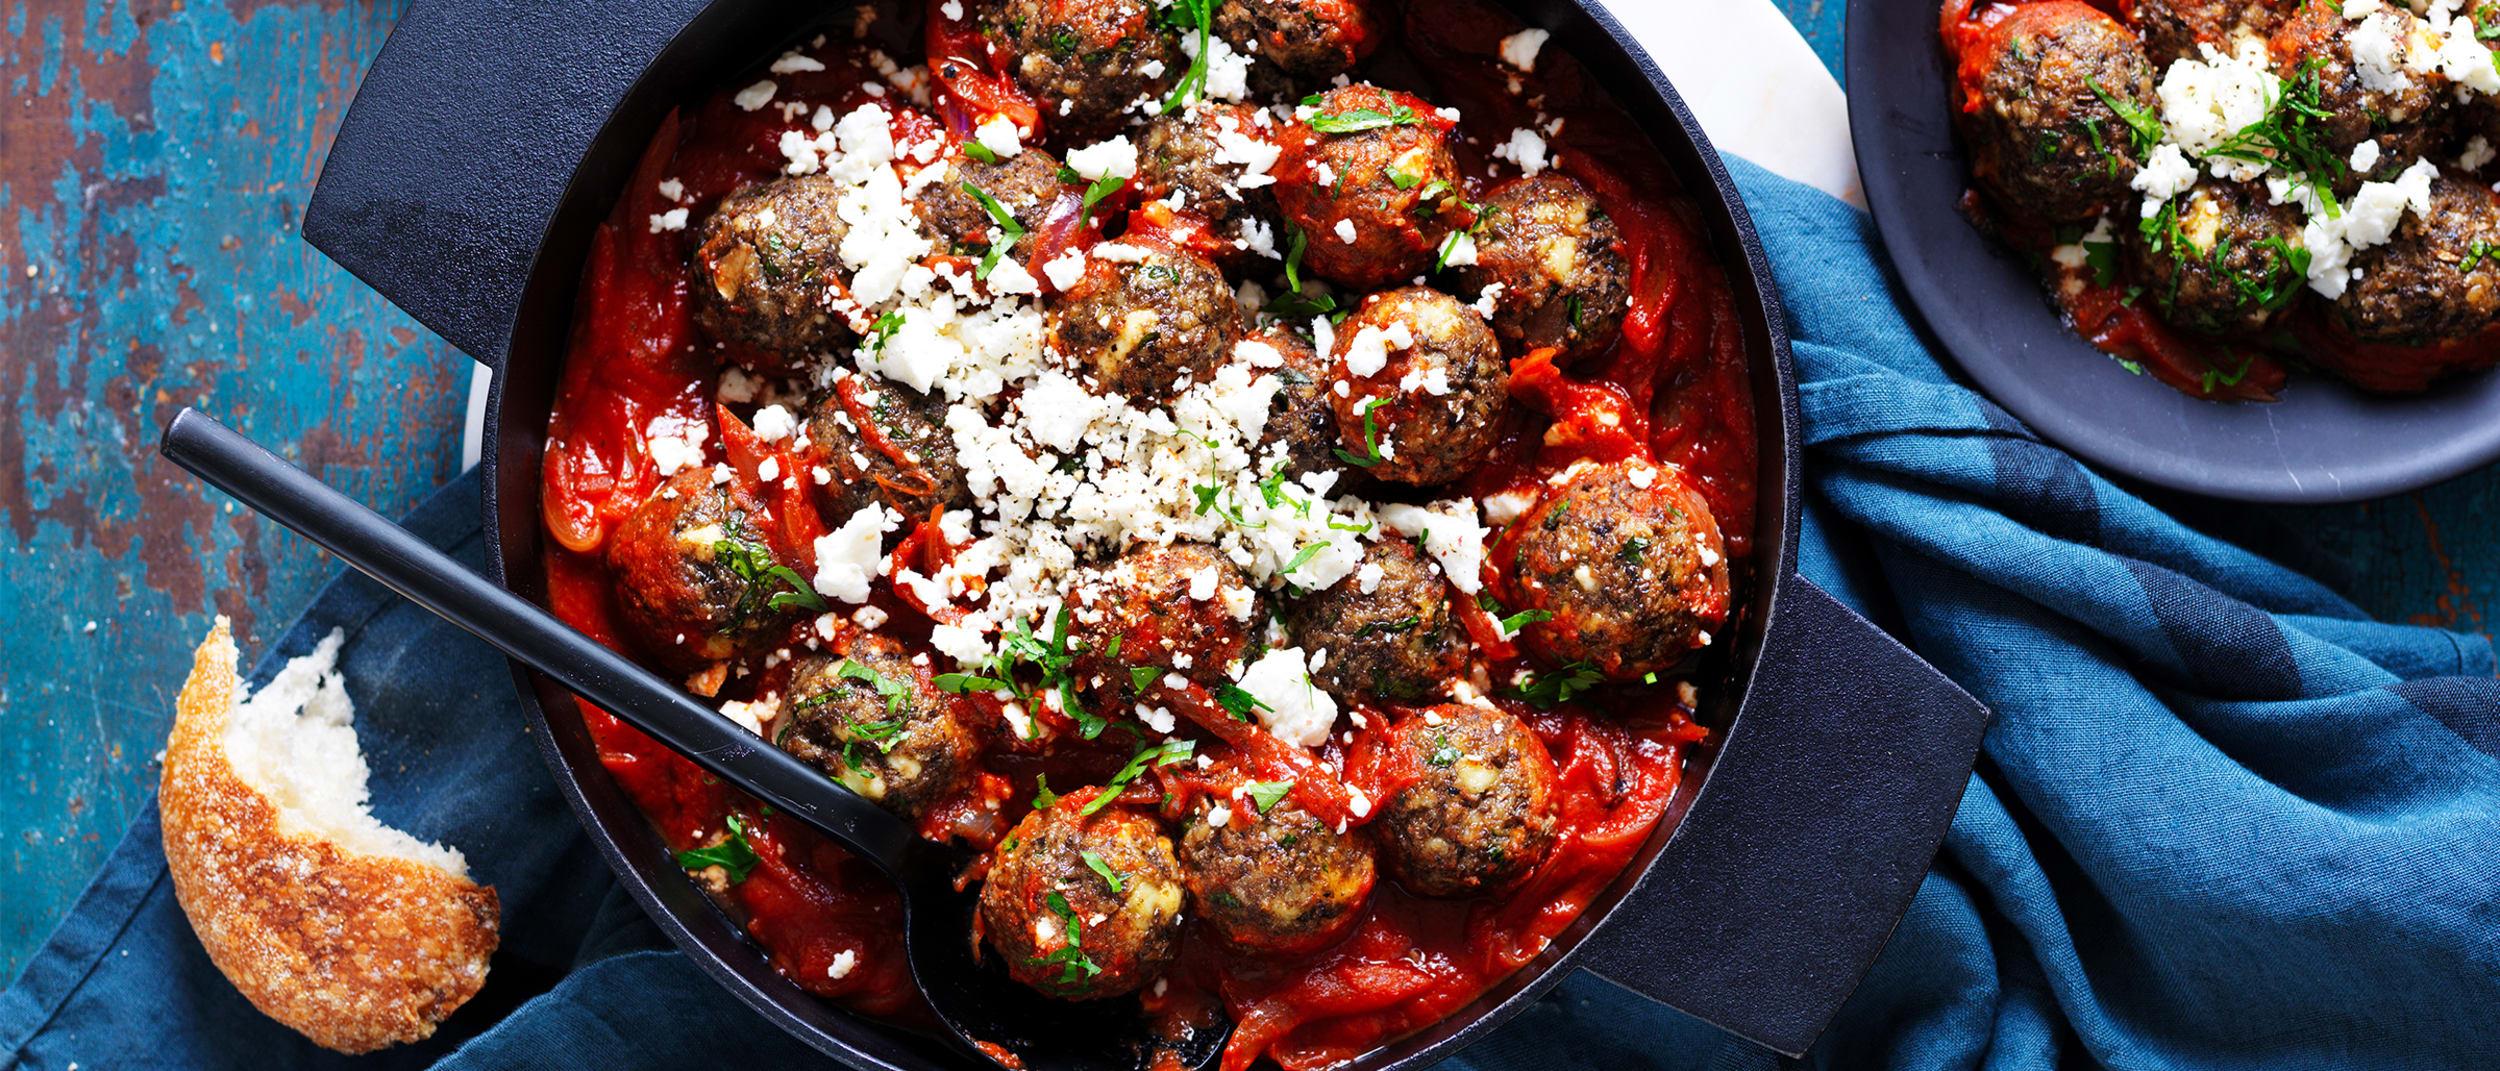 Ricotta and mushroom non-meatballs